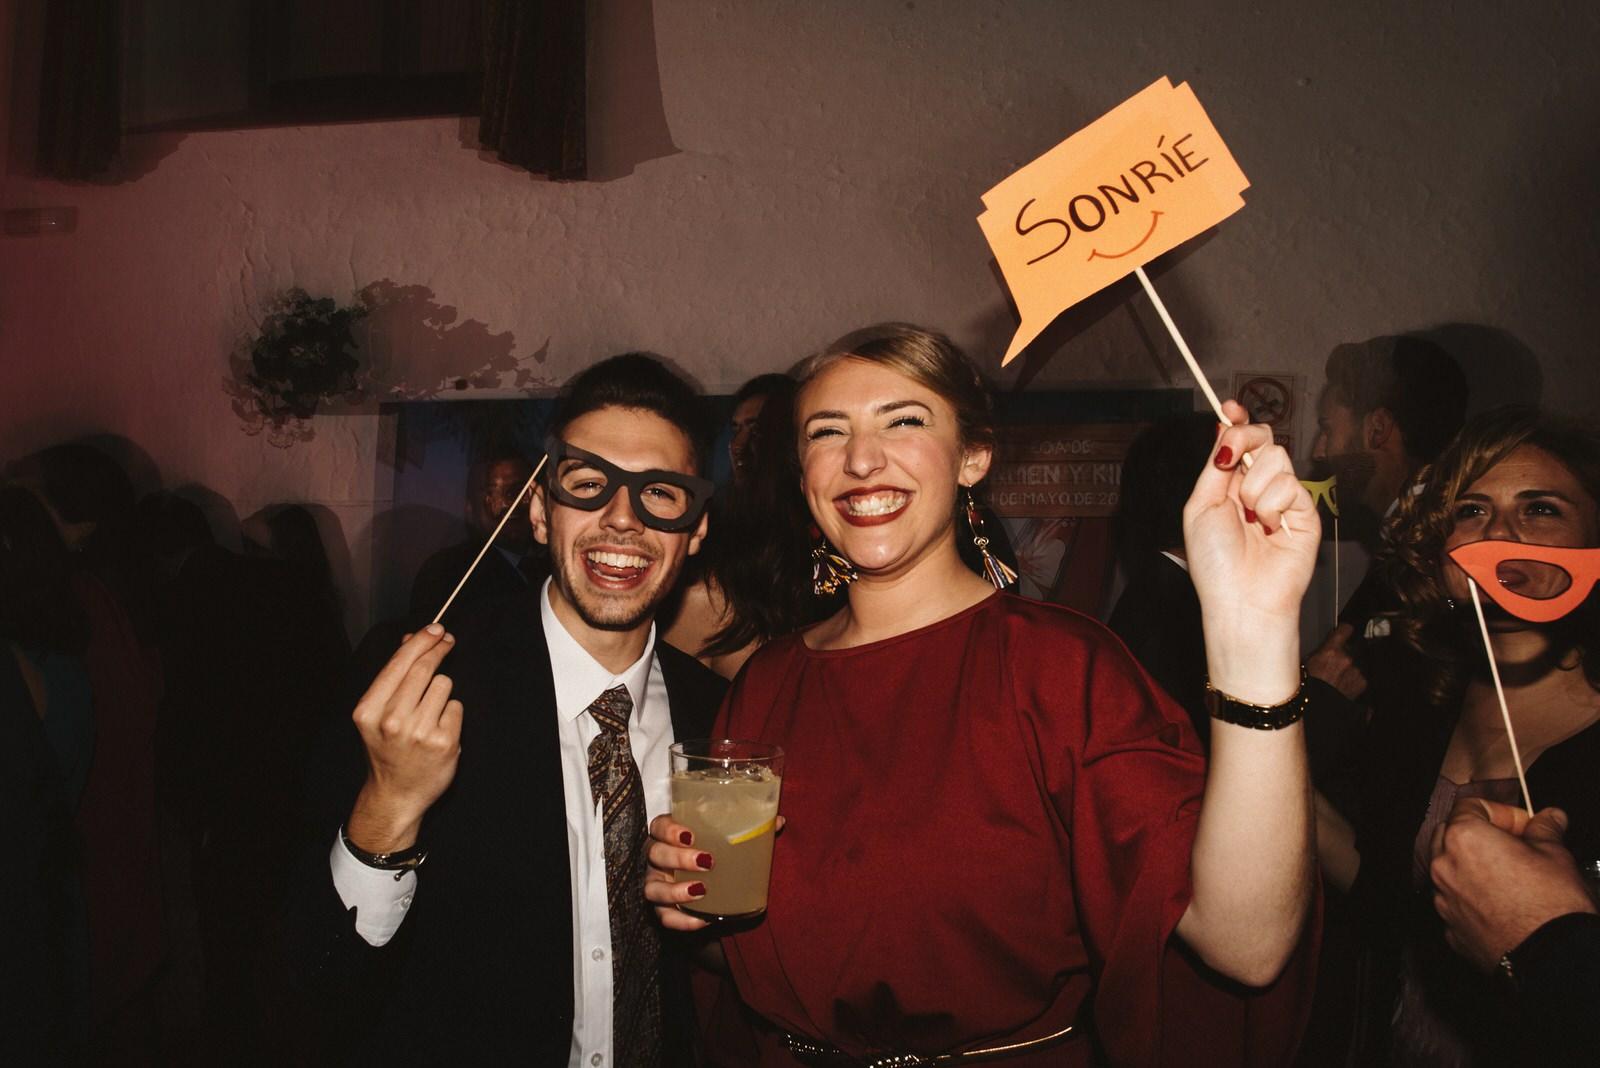 fotografo de bodas sevilla - fotografo boda - fotografía sevilla - Andrés AmarilloAAA_3816- fine.JPG